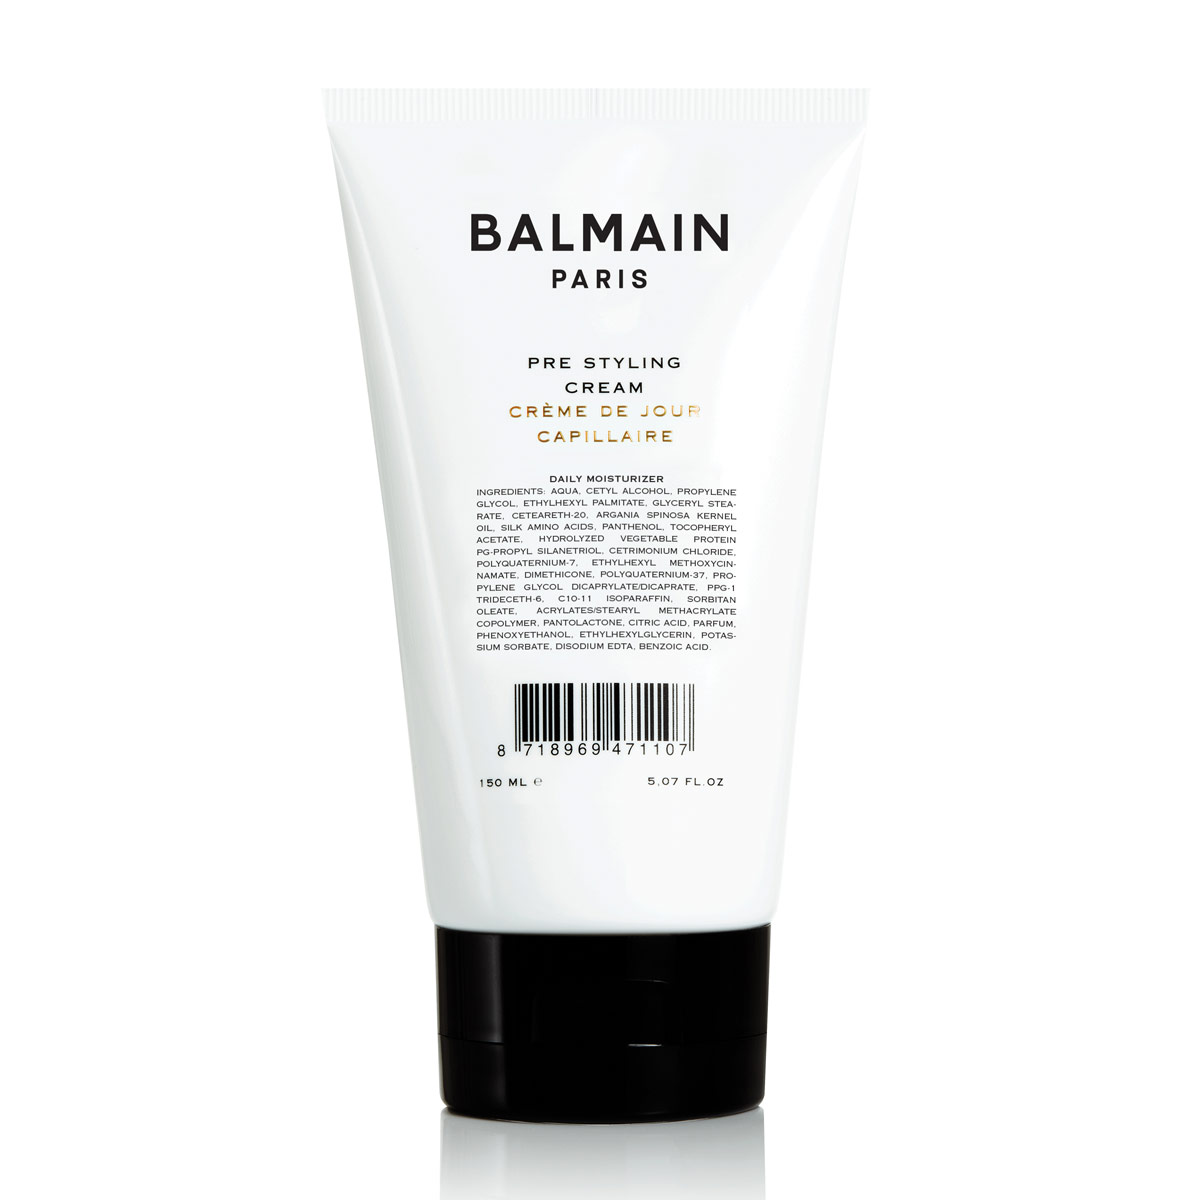 Balmain Pre Styling Cream 150 ml